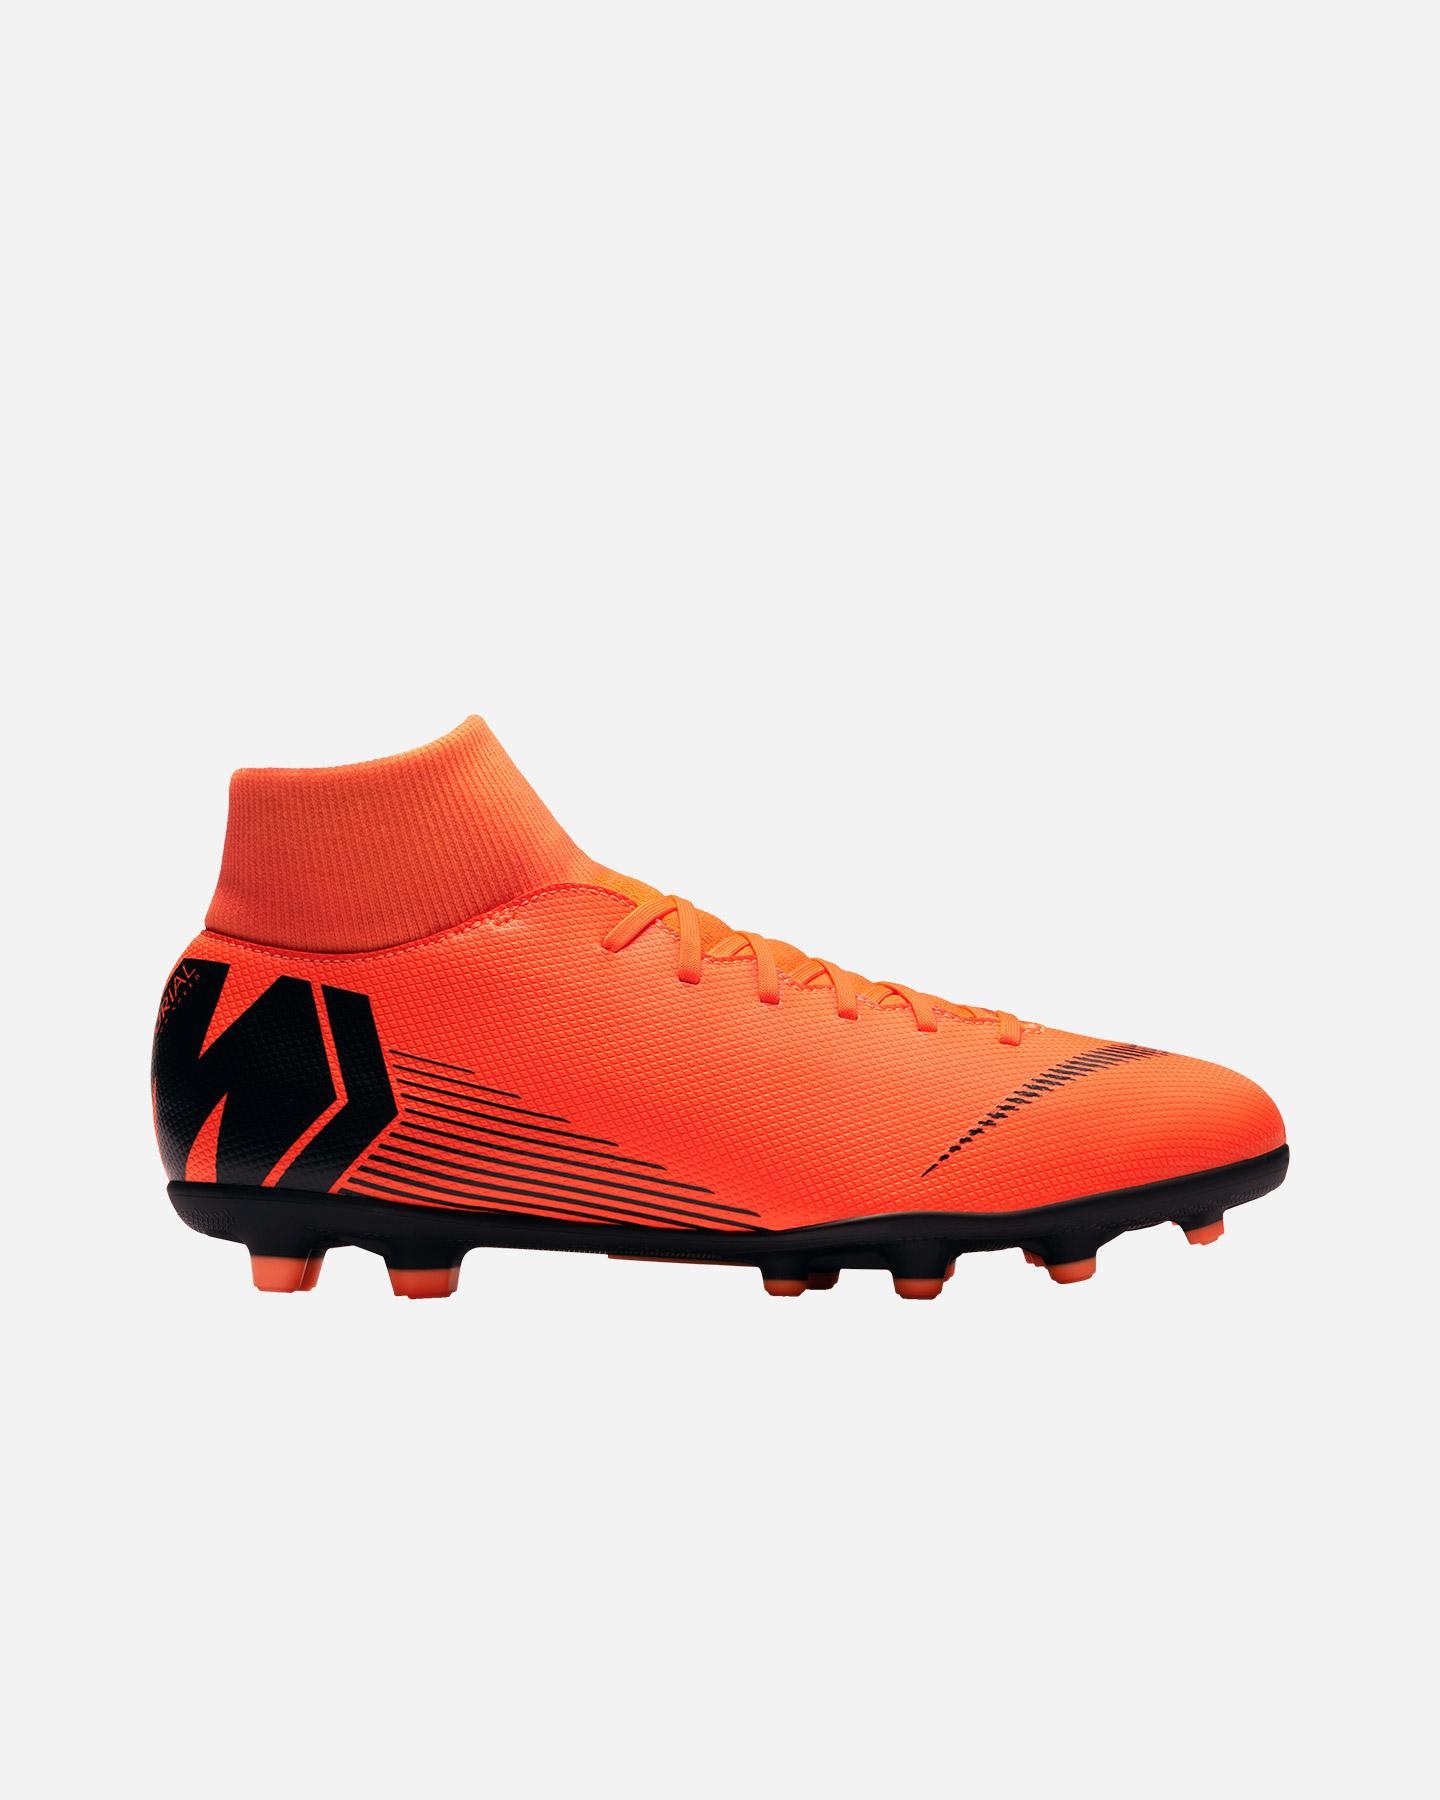 Superfly Sport Su Cisalfa Calcio Nike Mg Ah7363 Club Vi Scarpe M 810 TqPwdRP